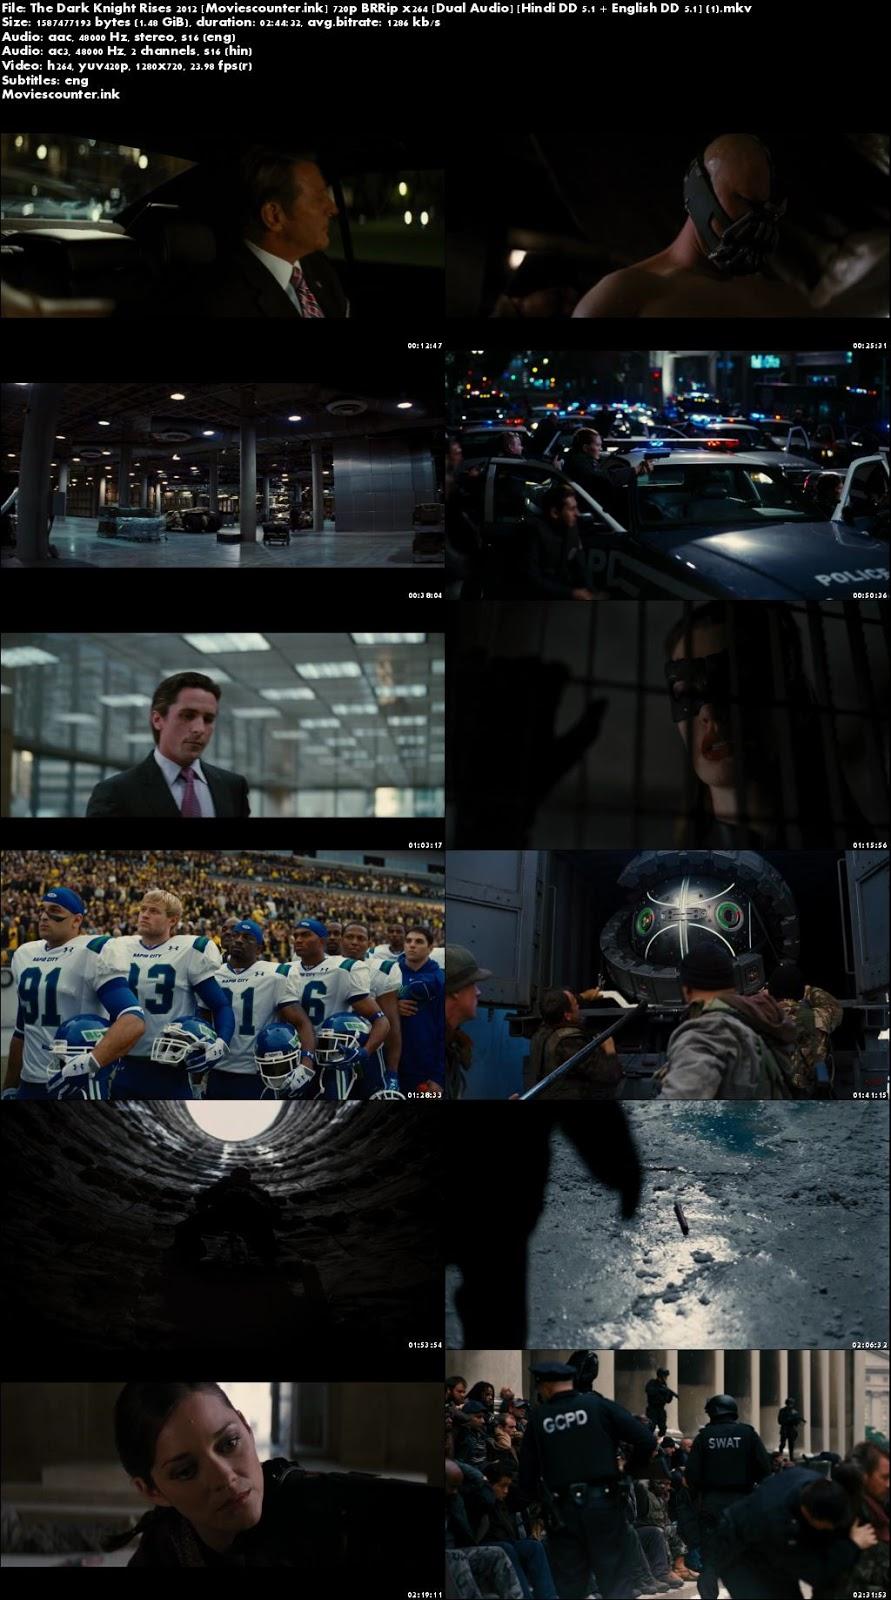 Poster The Dark Knight Rises - batman full movie download 720p hd  Dual Audio 2012